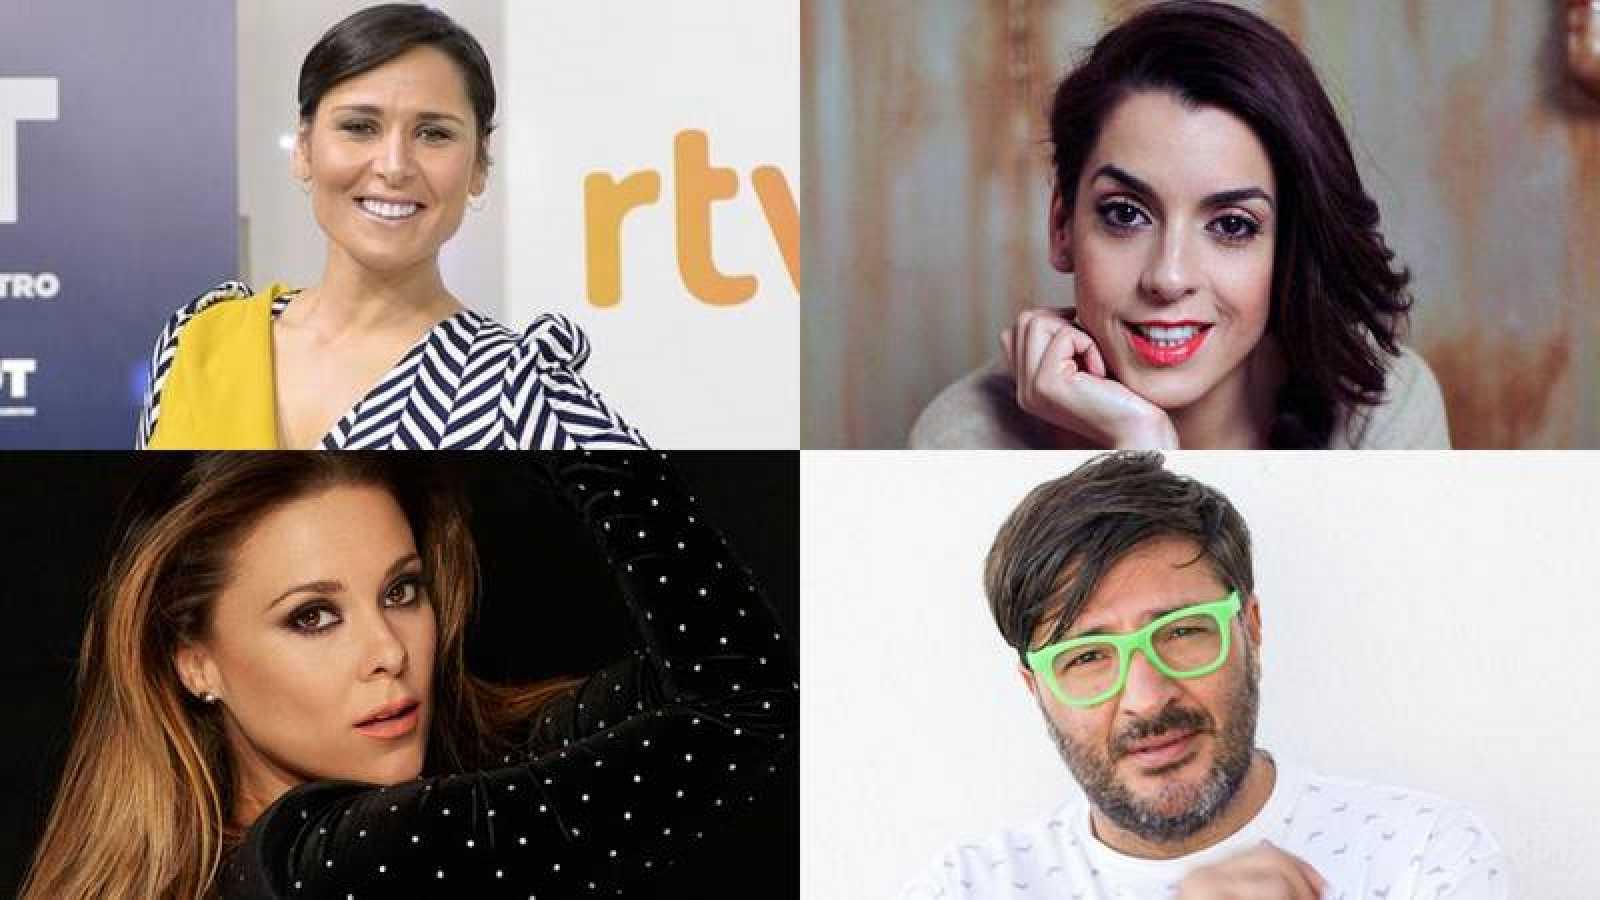 Rosa López, Ruth Lorenzo, Lorena Gómez y Wally López en #EurovisiónOT